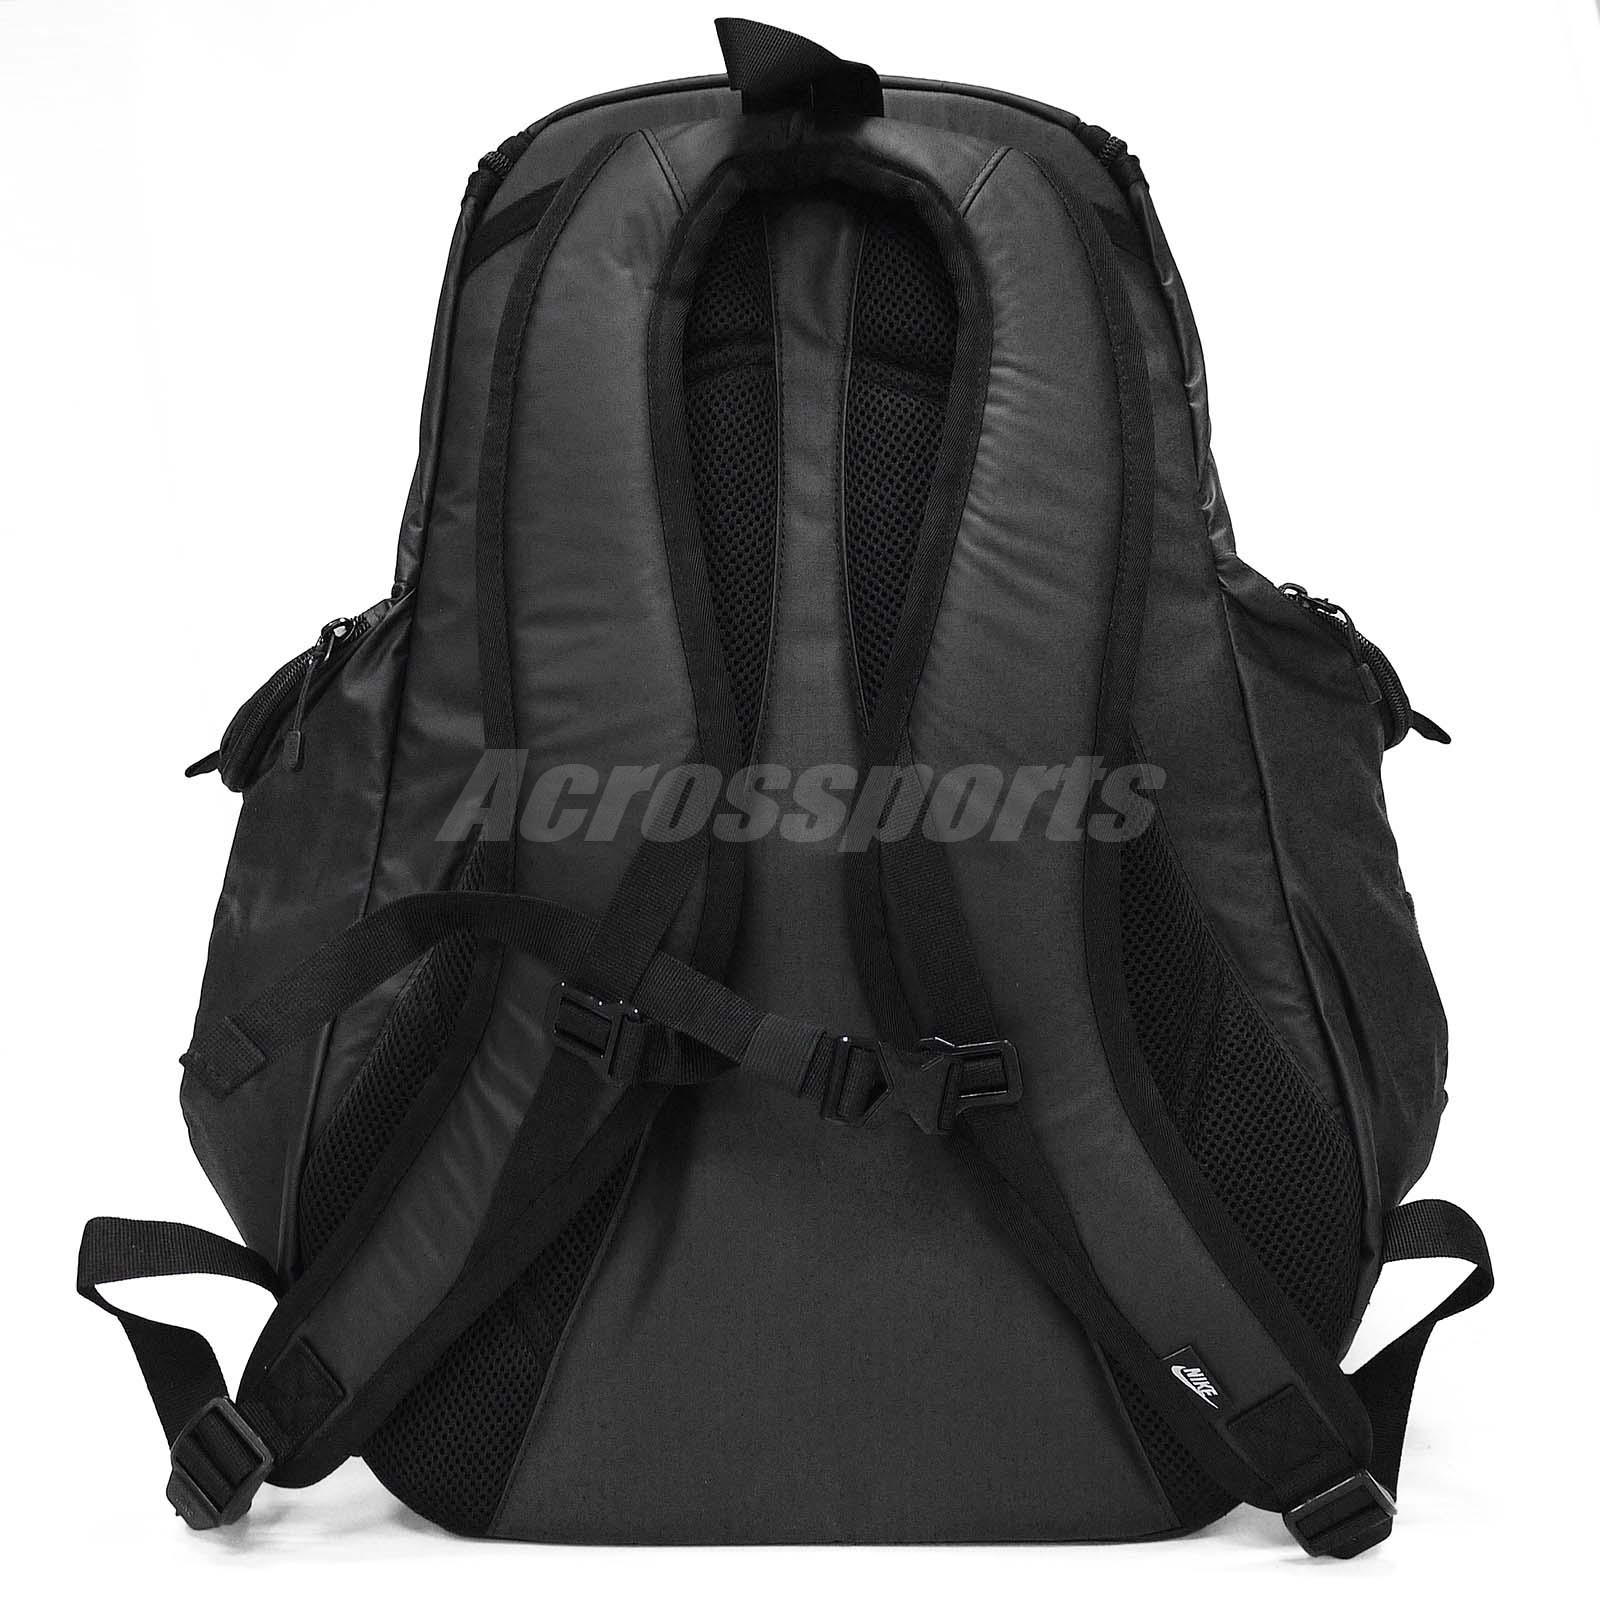 ... size 40 9c78e 75440 Nike Cheyenne Responder Black Mens Sports Travel  Backpack BP ... 2e726c5617